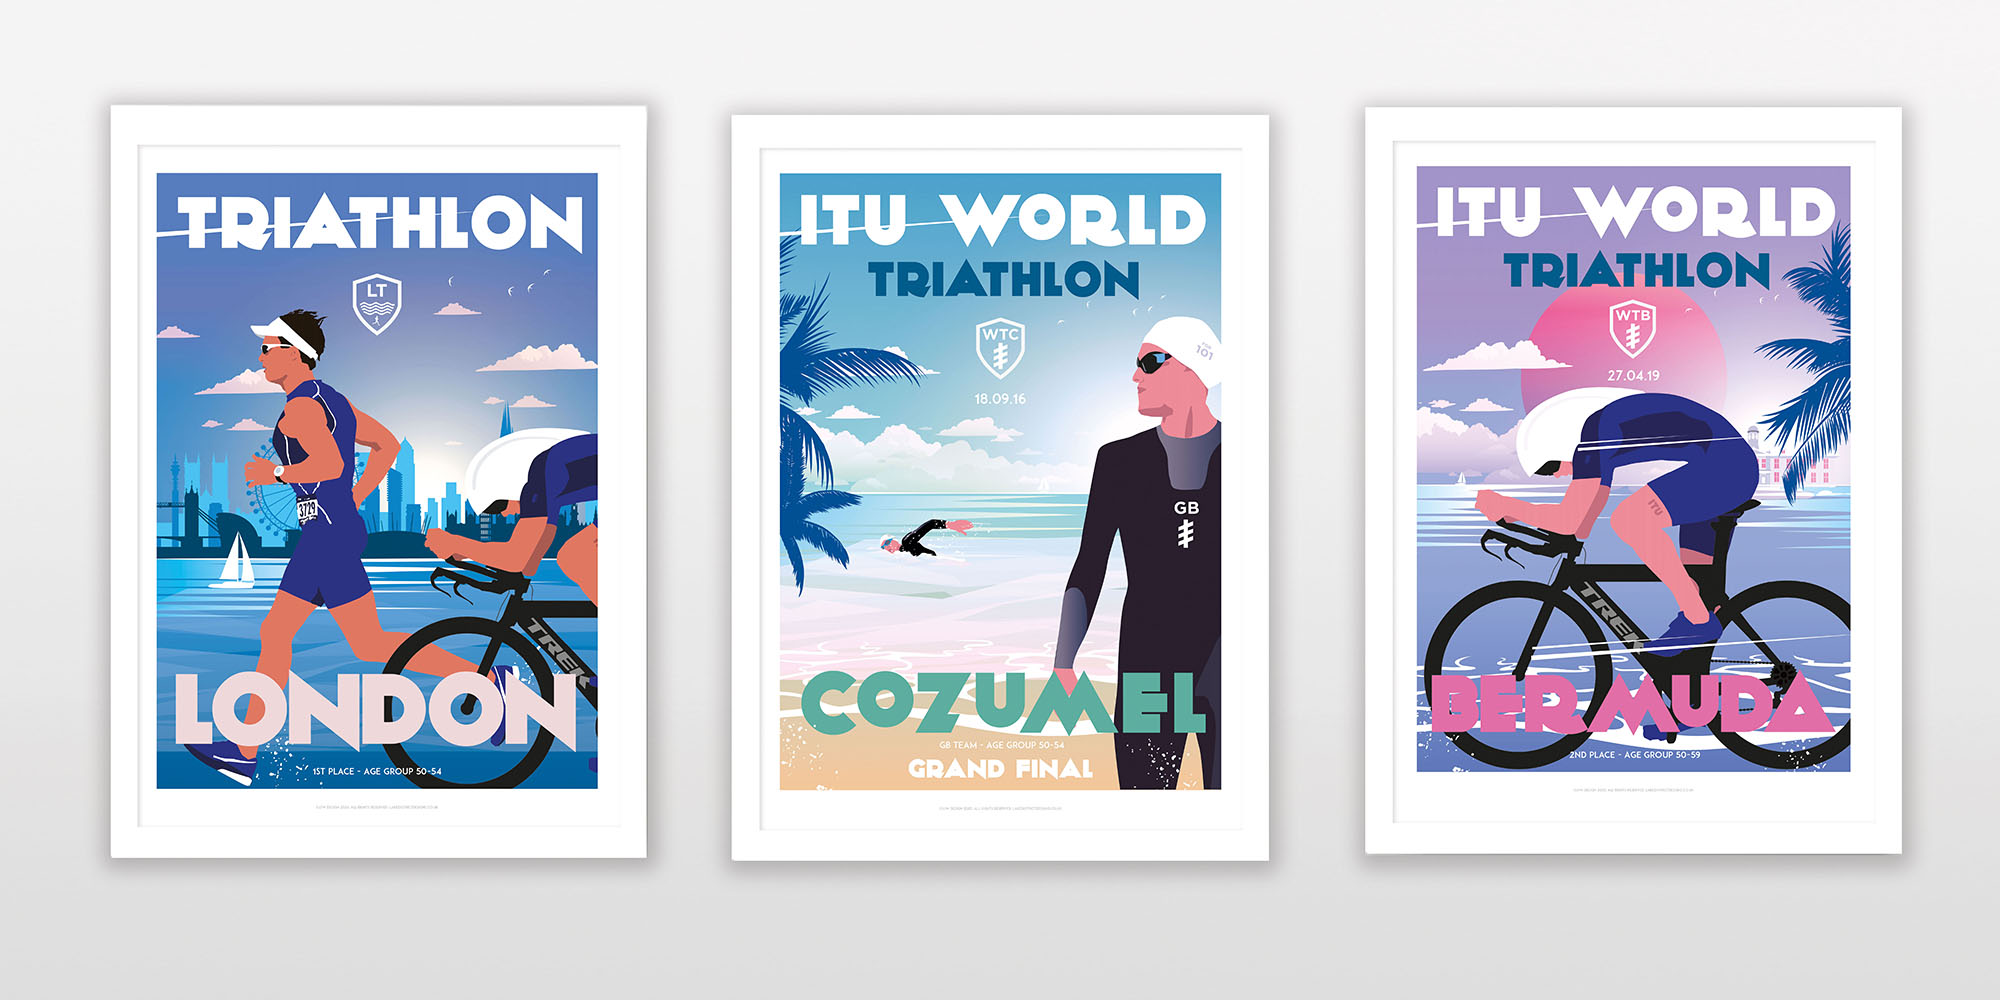 Triathon posters